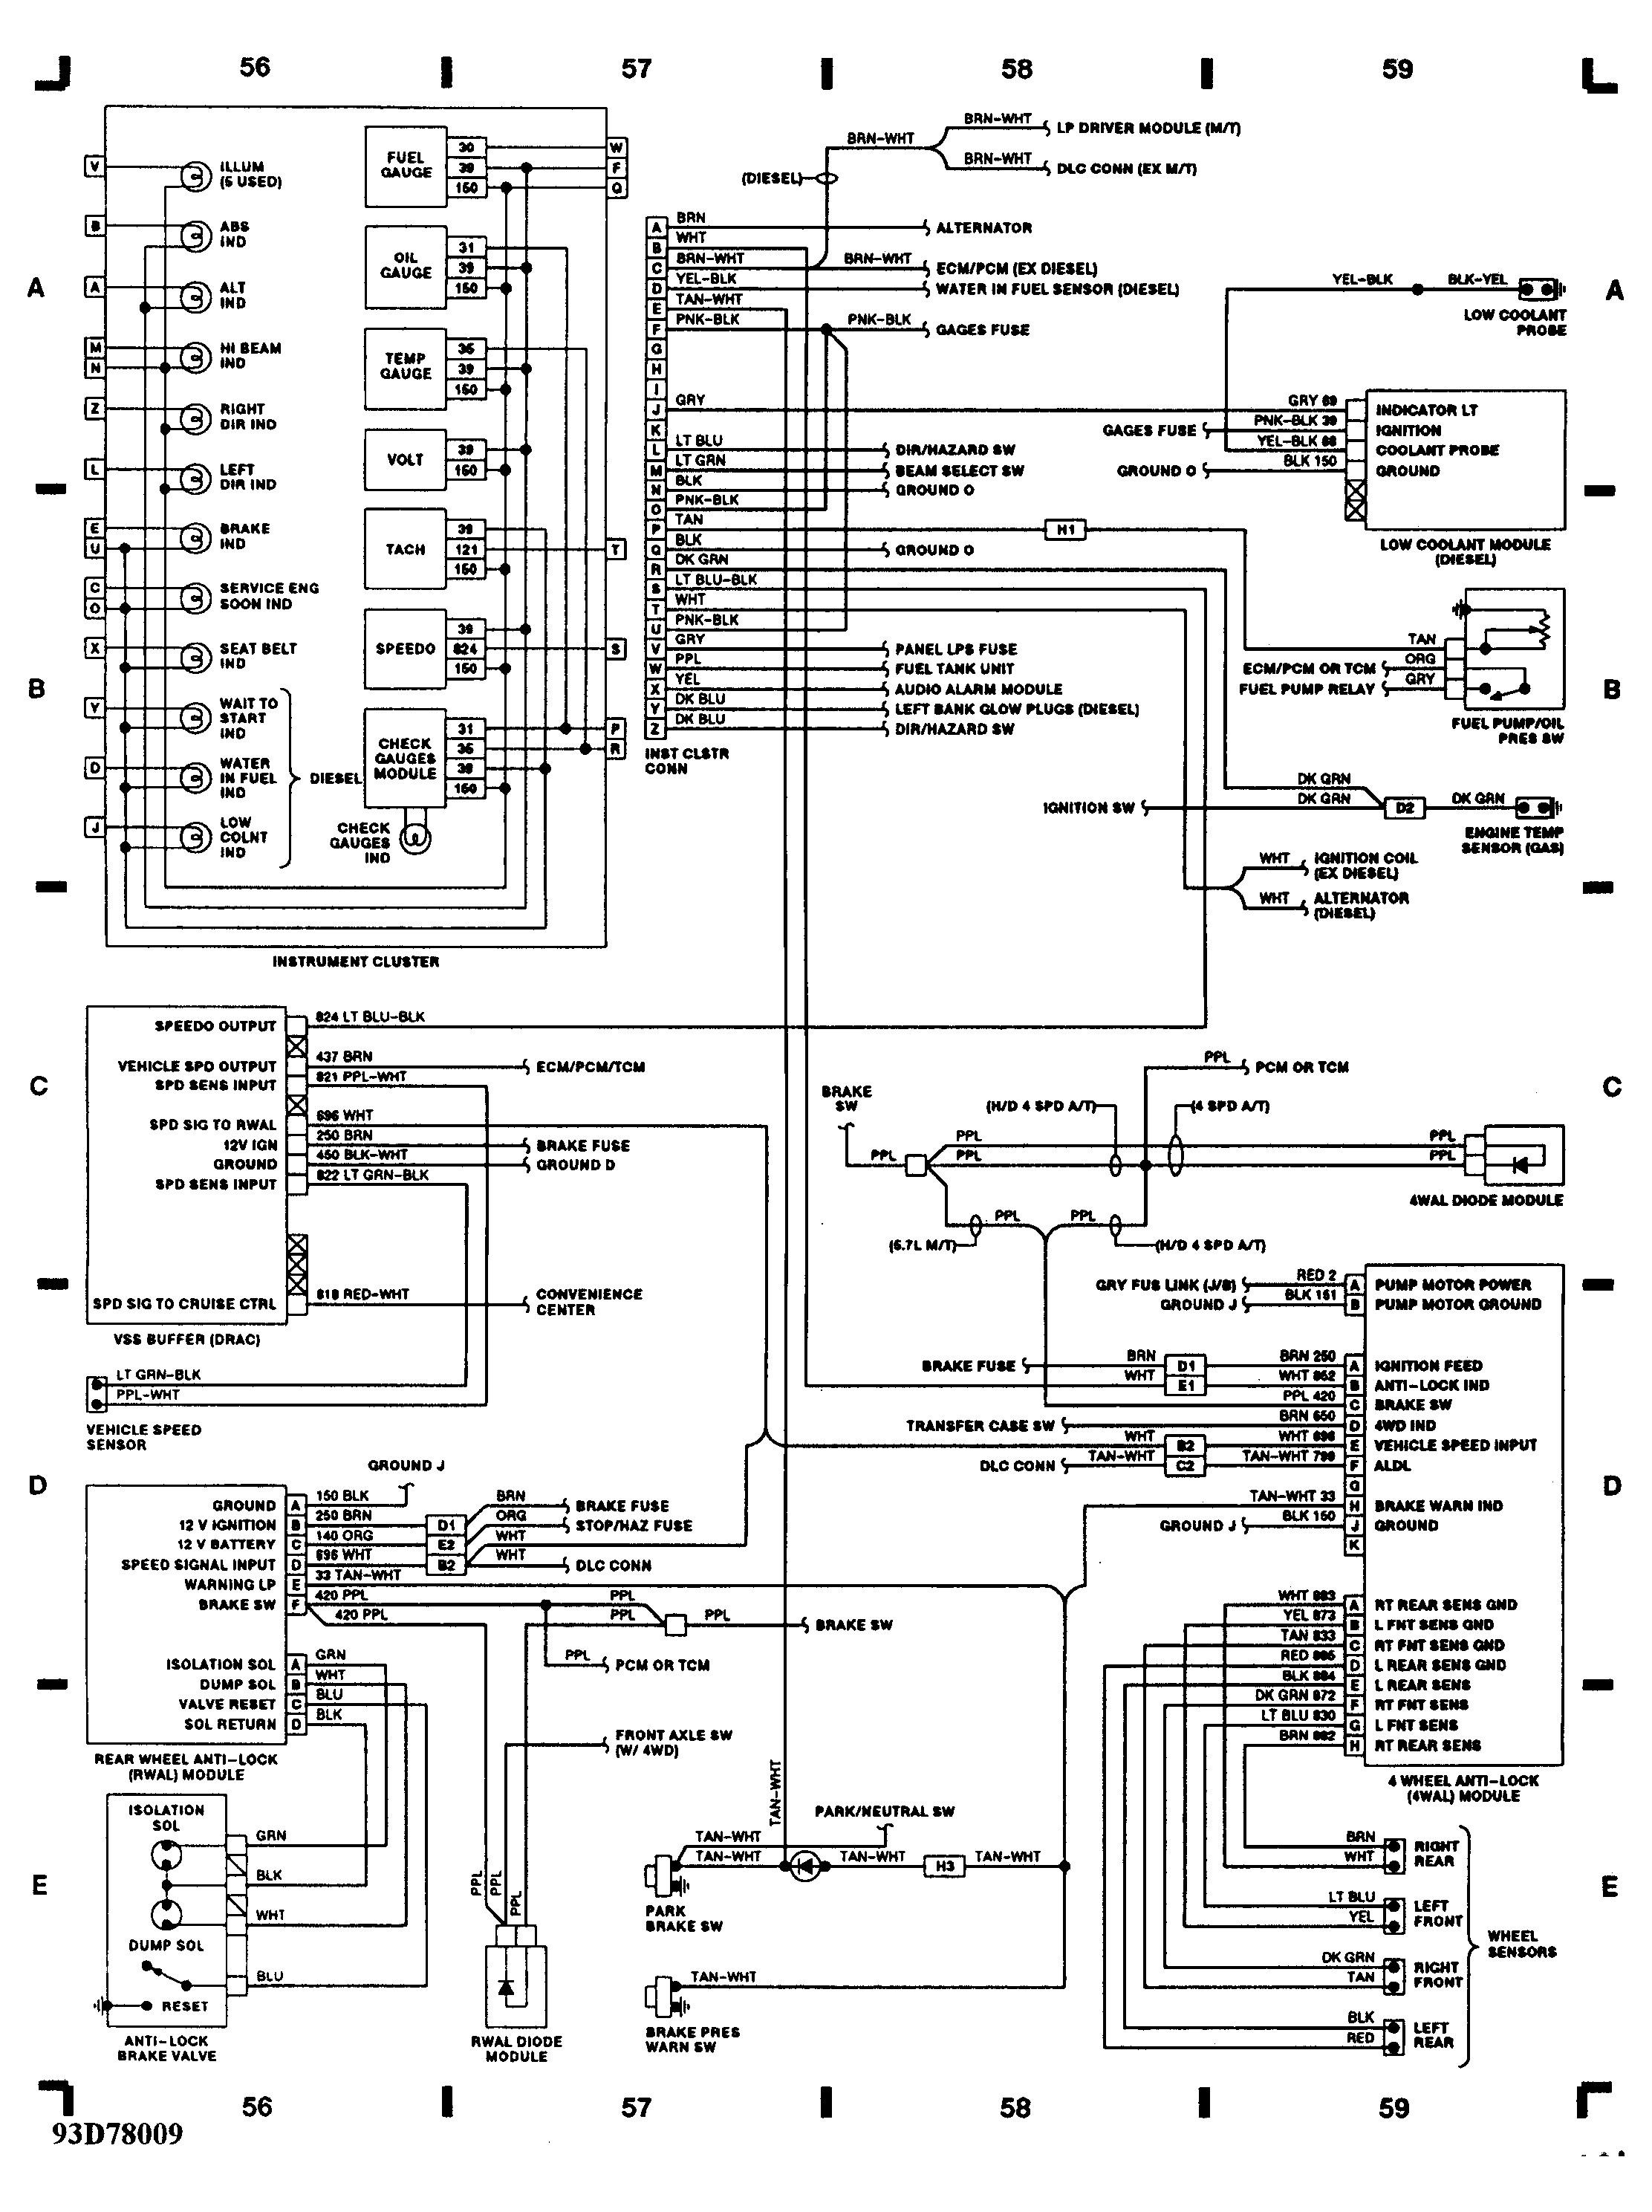 Cat 3126 Engine Wiring Diagram Wiring Diagram